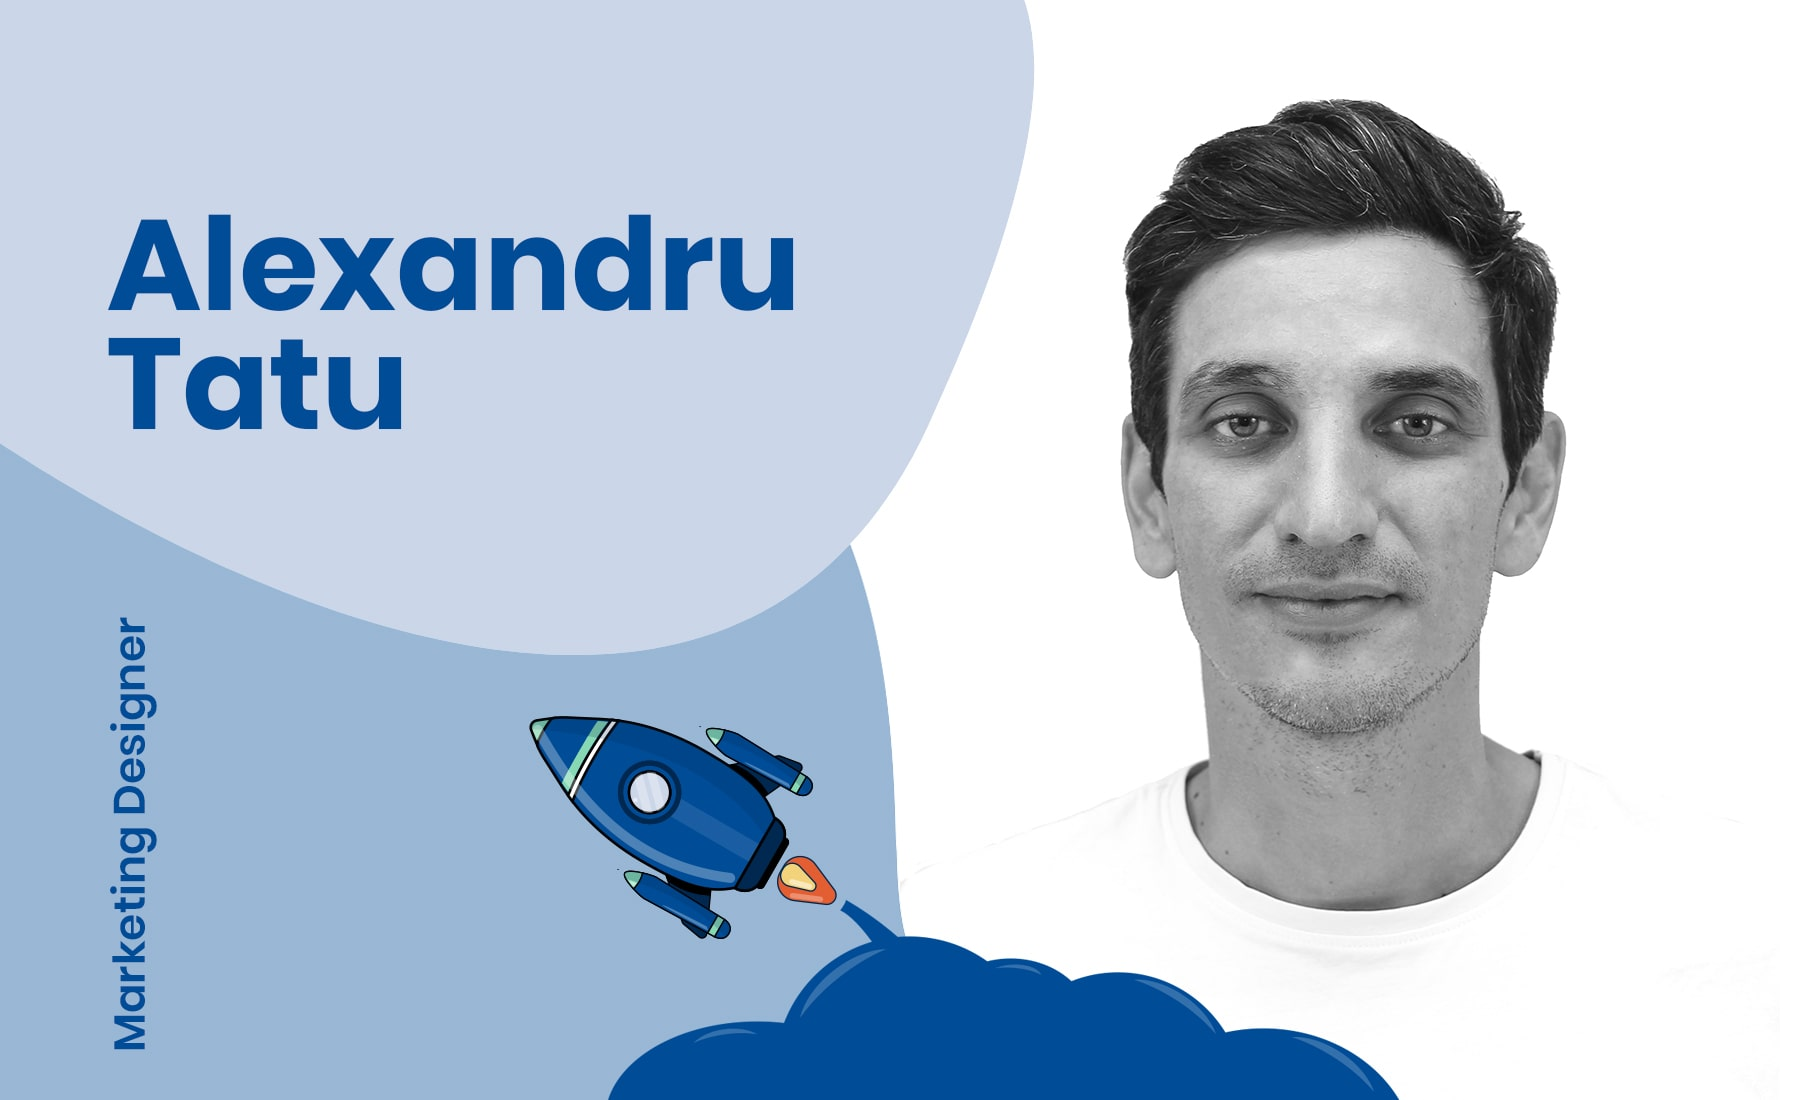 Interview With Designer, Alexandru Tatu